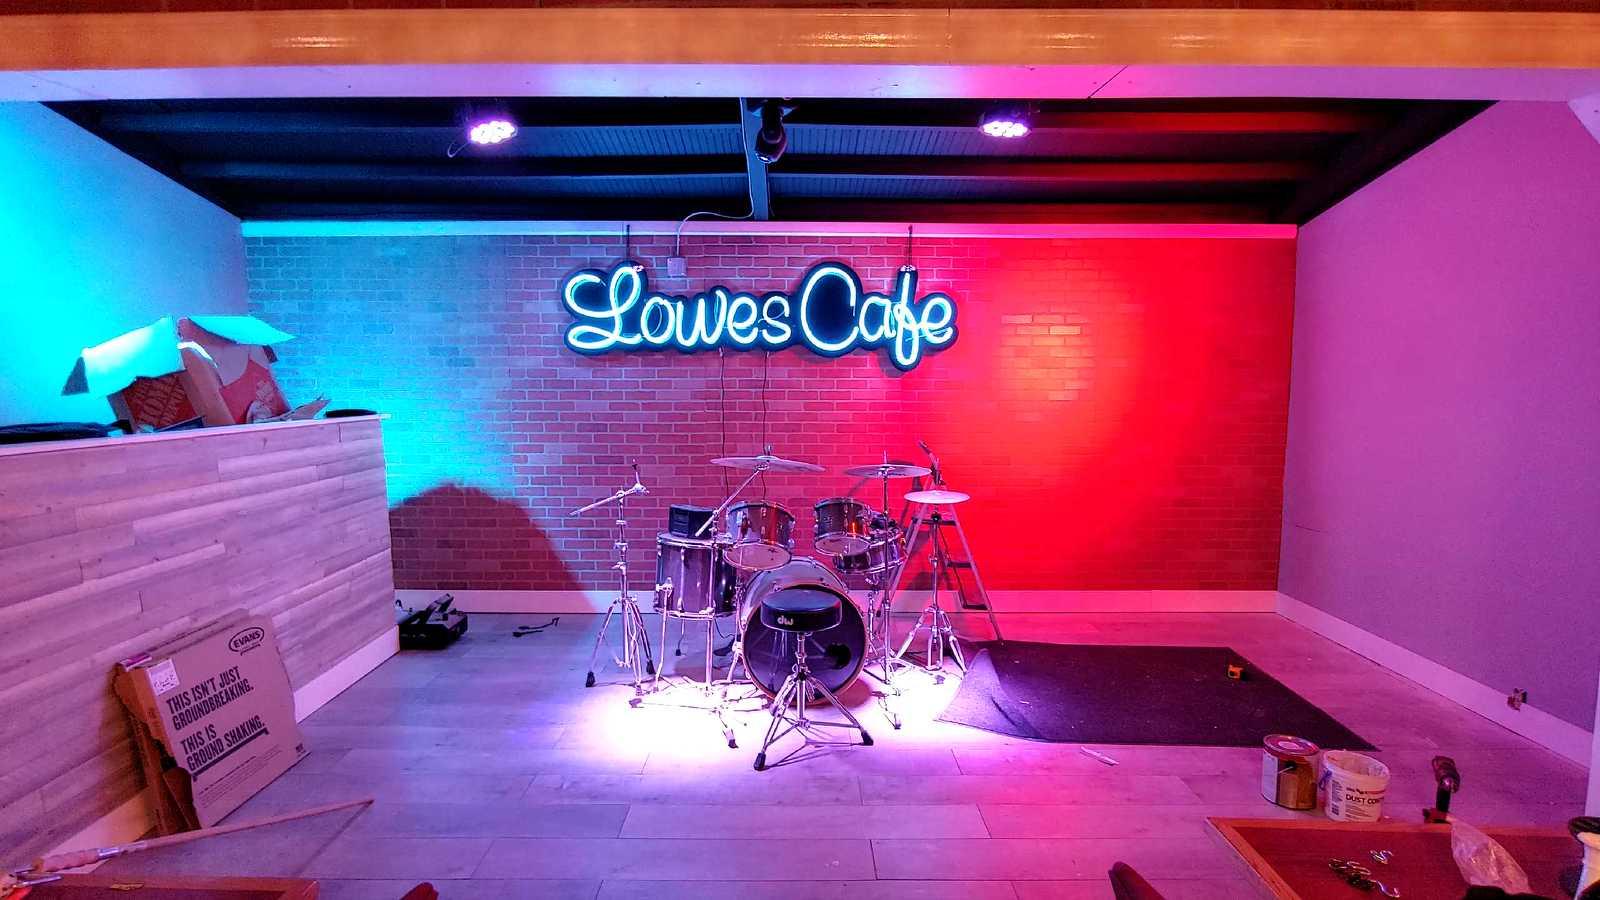 Creative St. Louis Signs